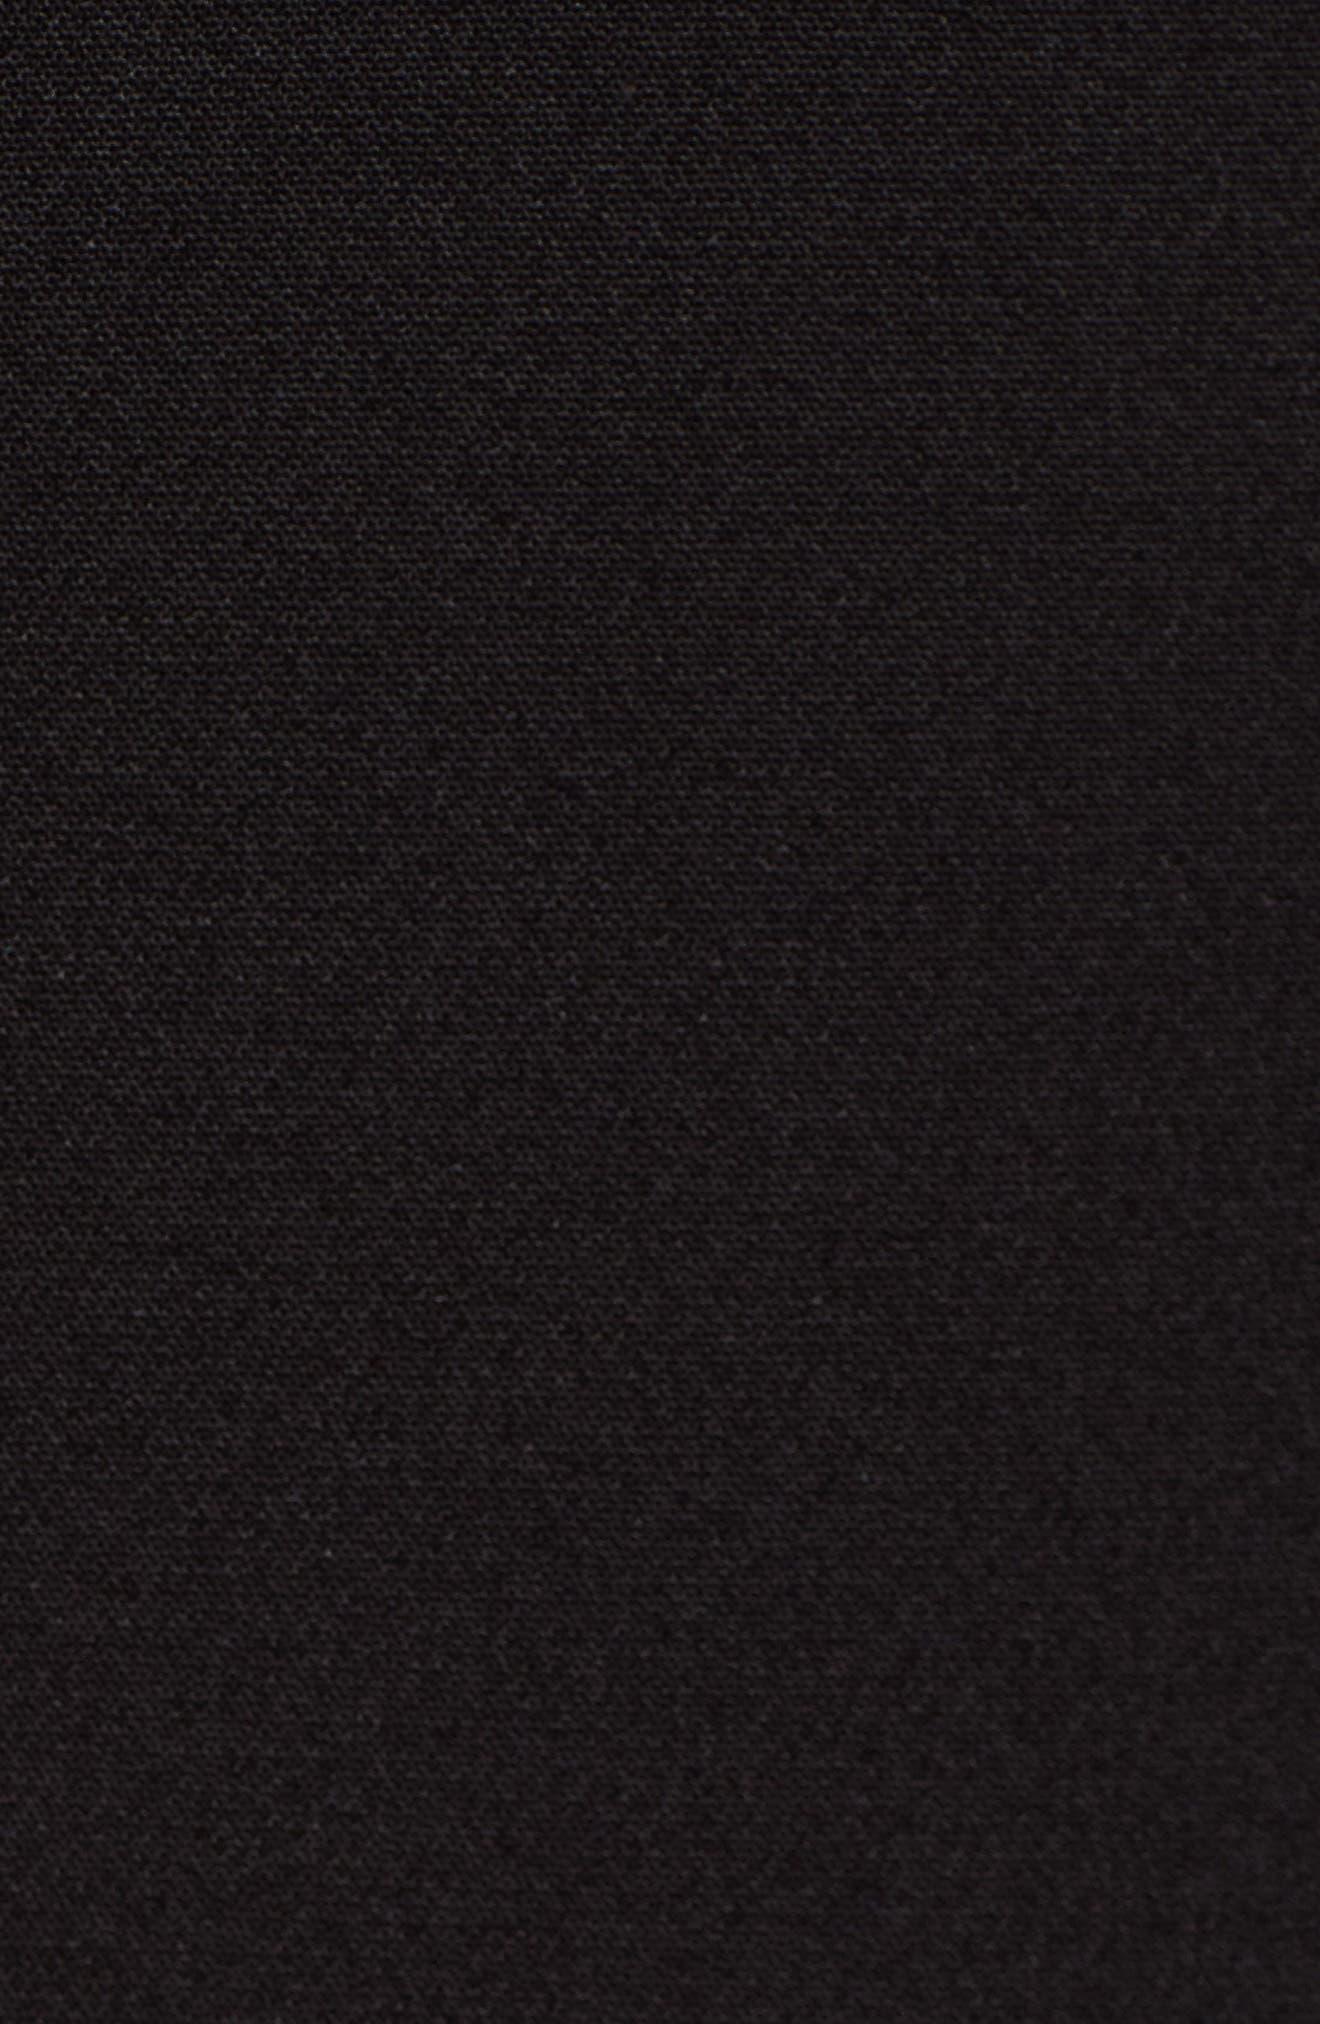 Slim Pants,                             Alternate thumbnail 5, color,                             BLACK TECH